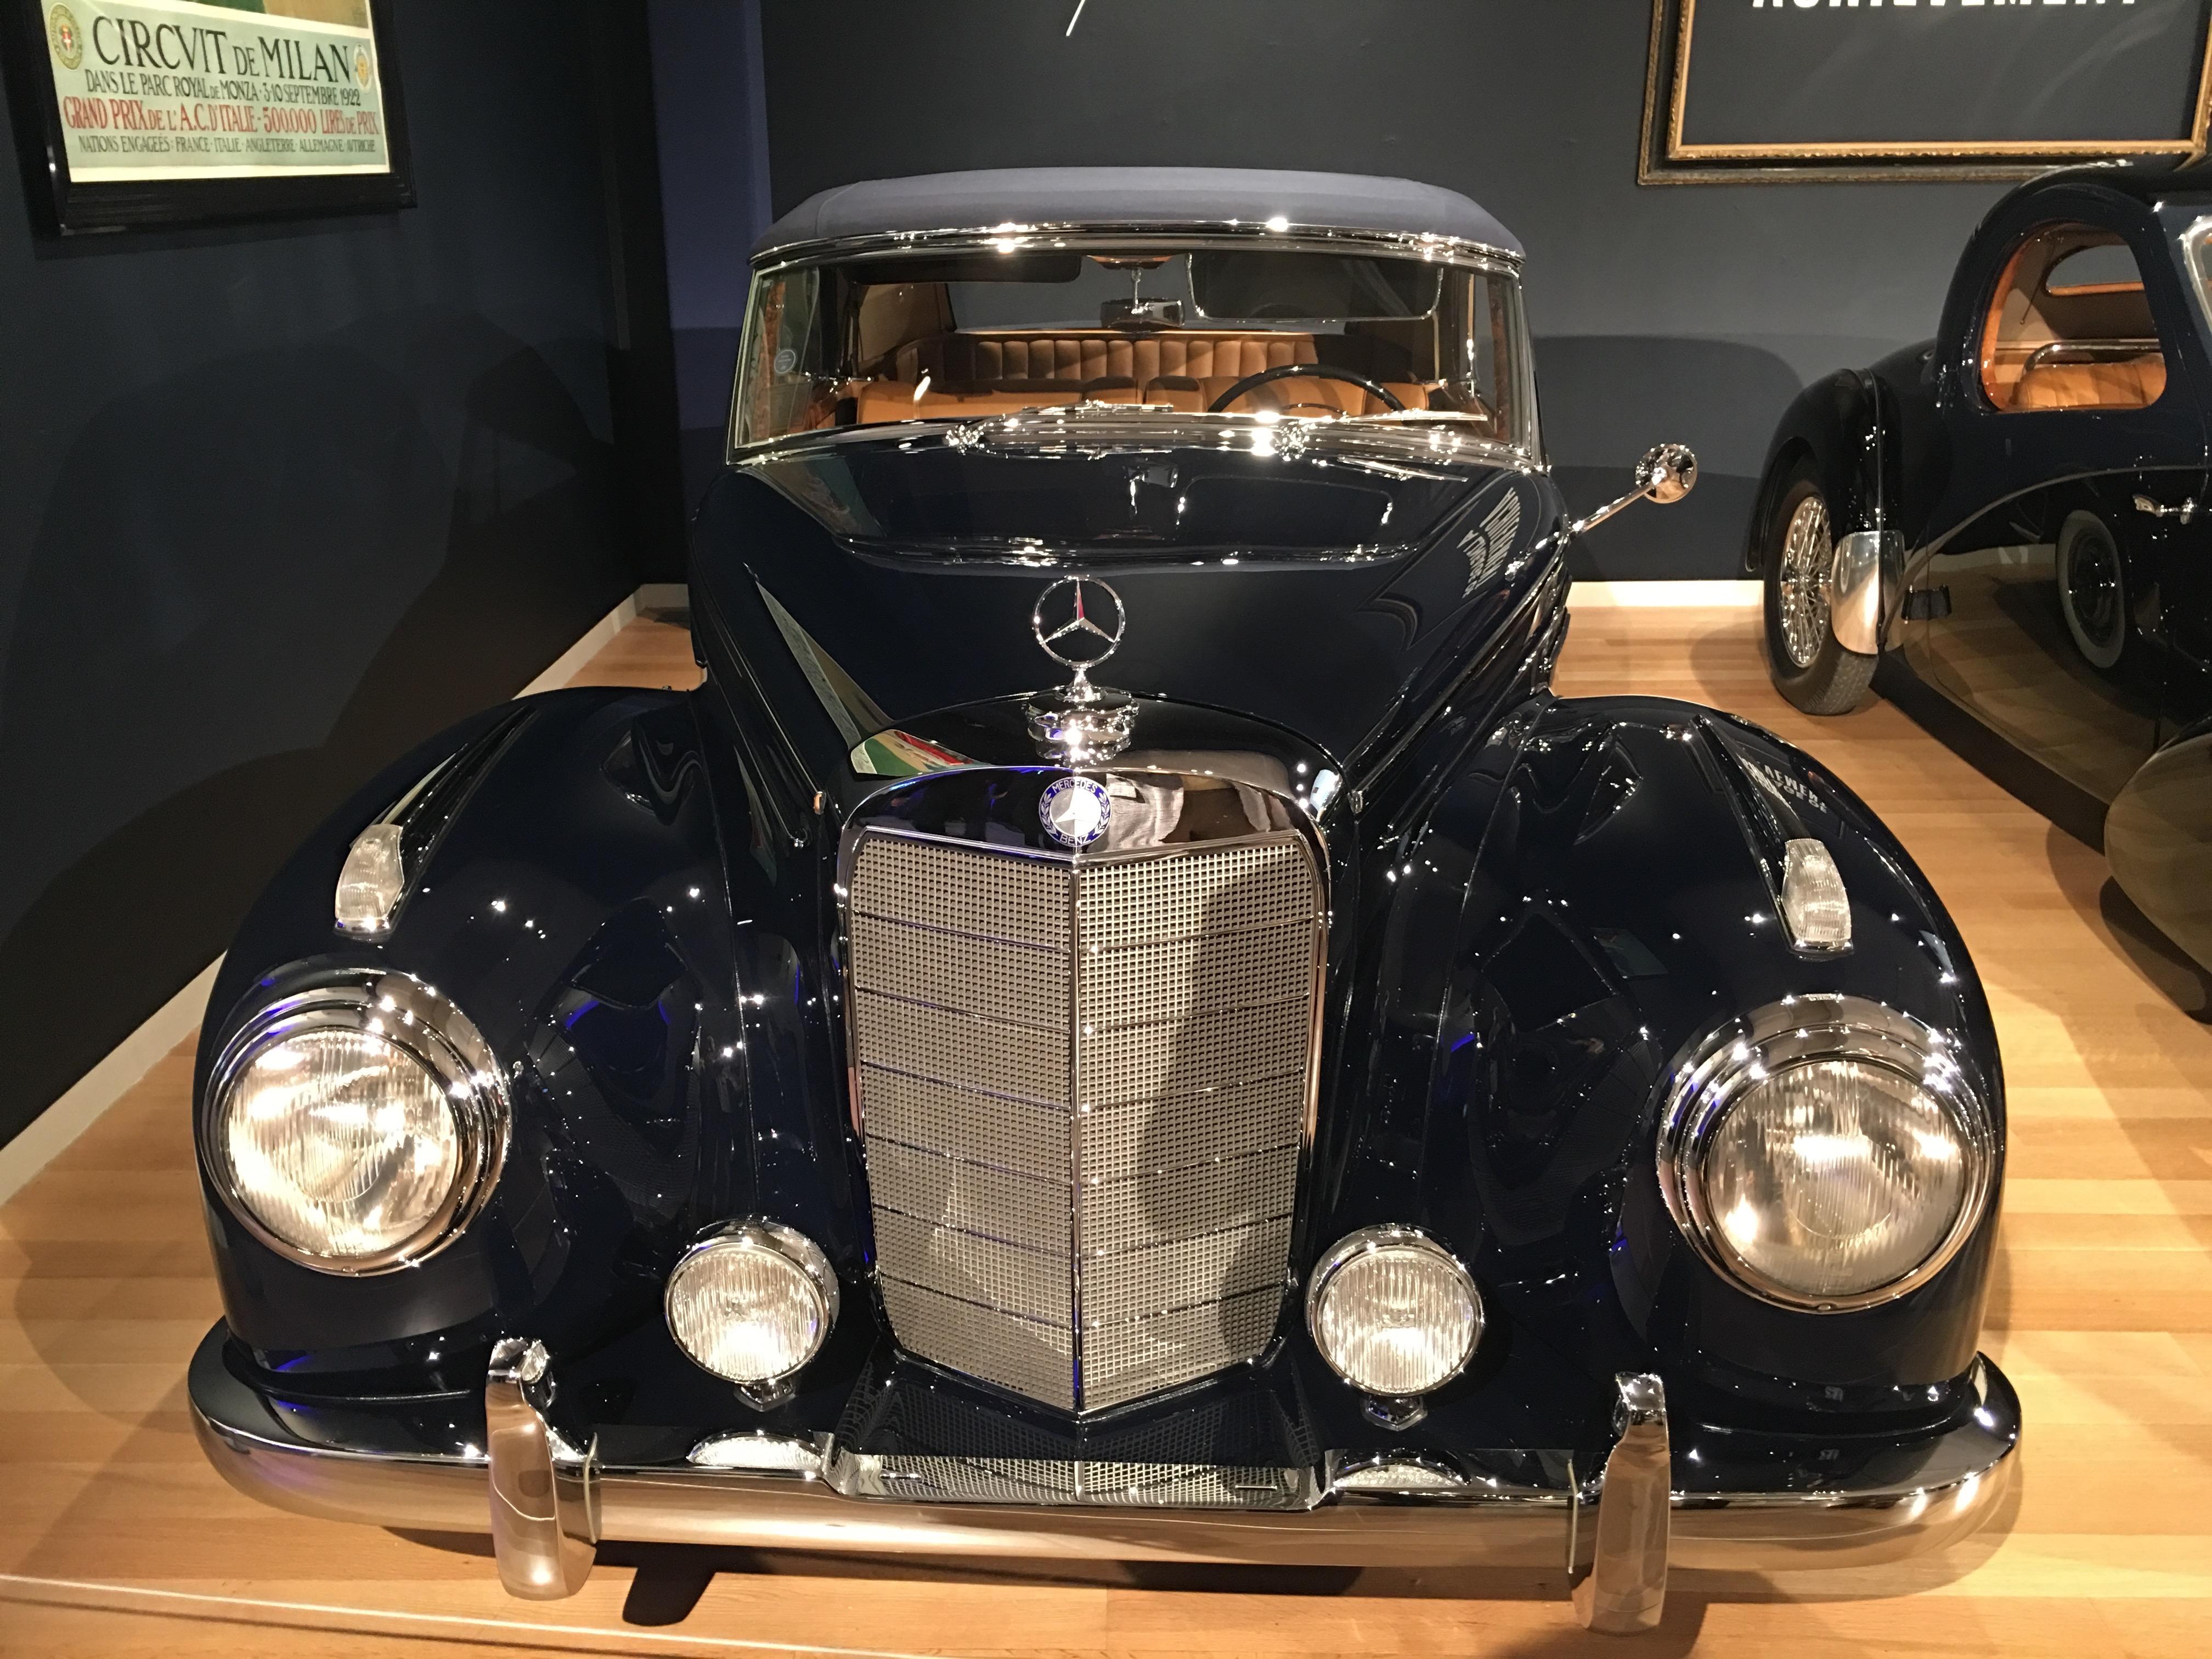 1956 Mercedes-Benz 300 Sc Roadster International Car Shipping